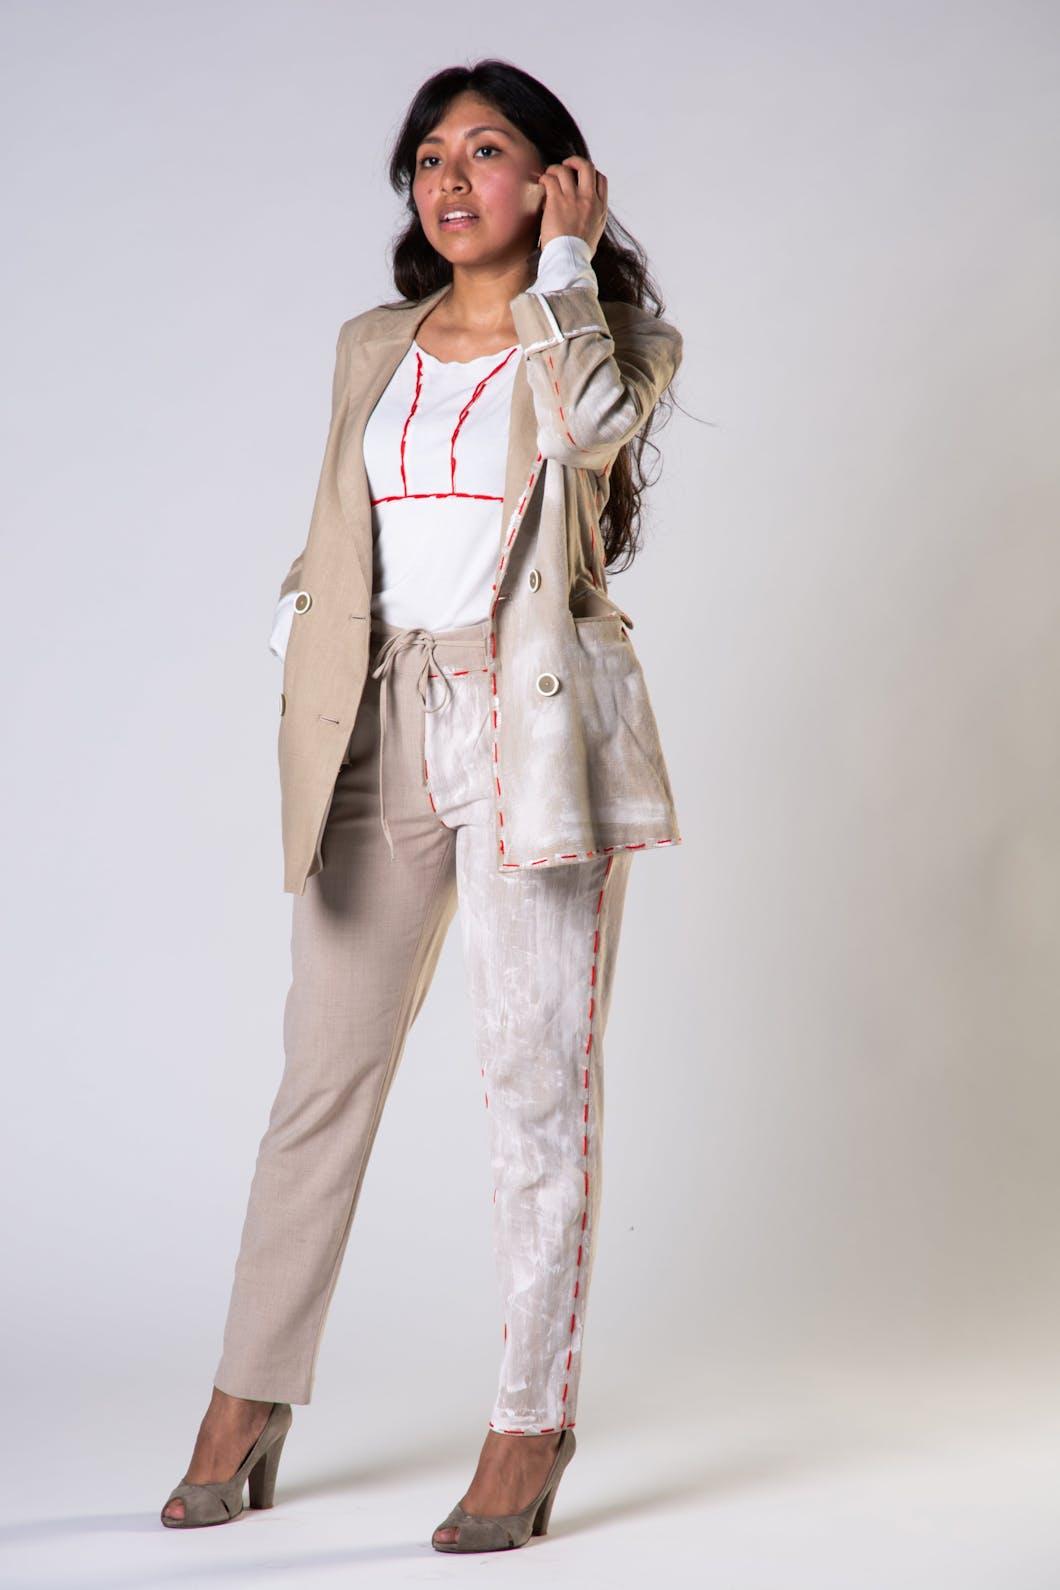 VG_Fashion Designer